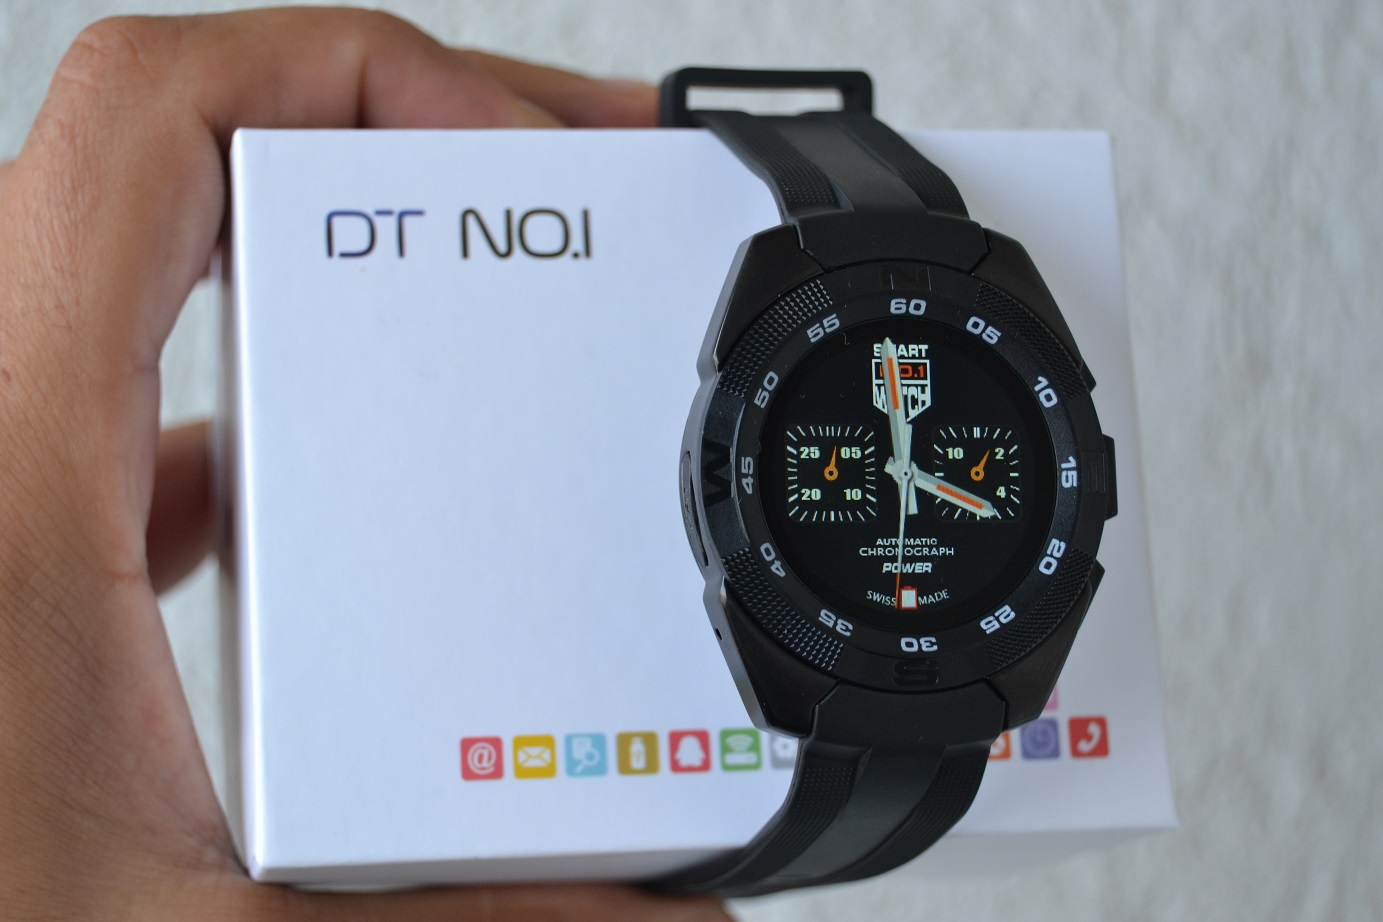 DSC_0748 NO.1 G5 smartwatch, unboxing si scurt review, pret mic si dotari bune